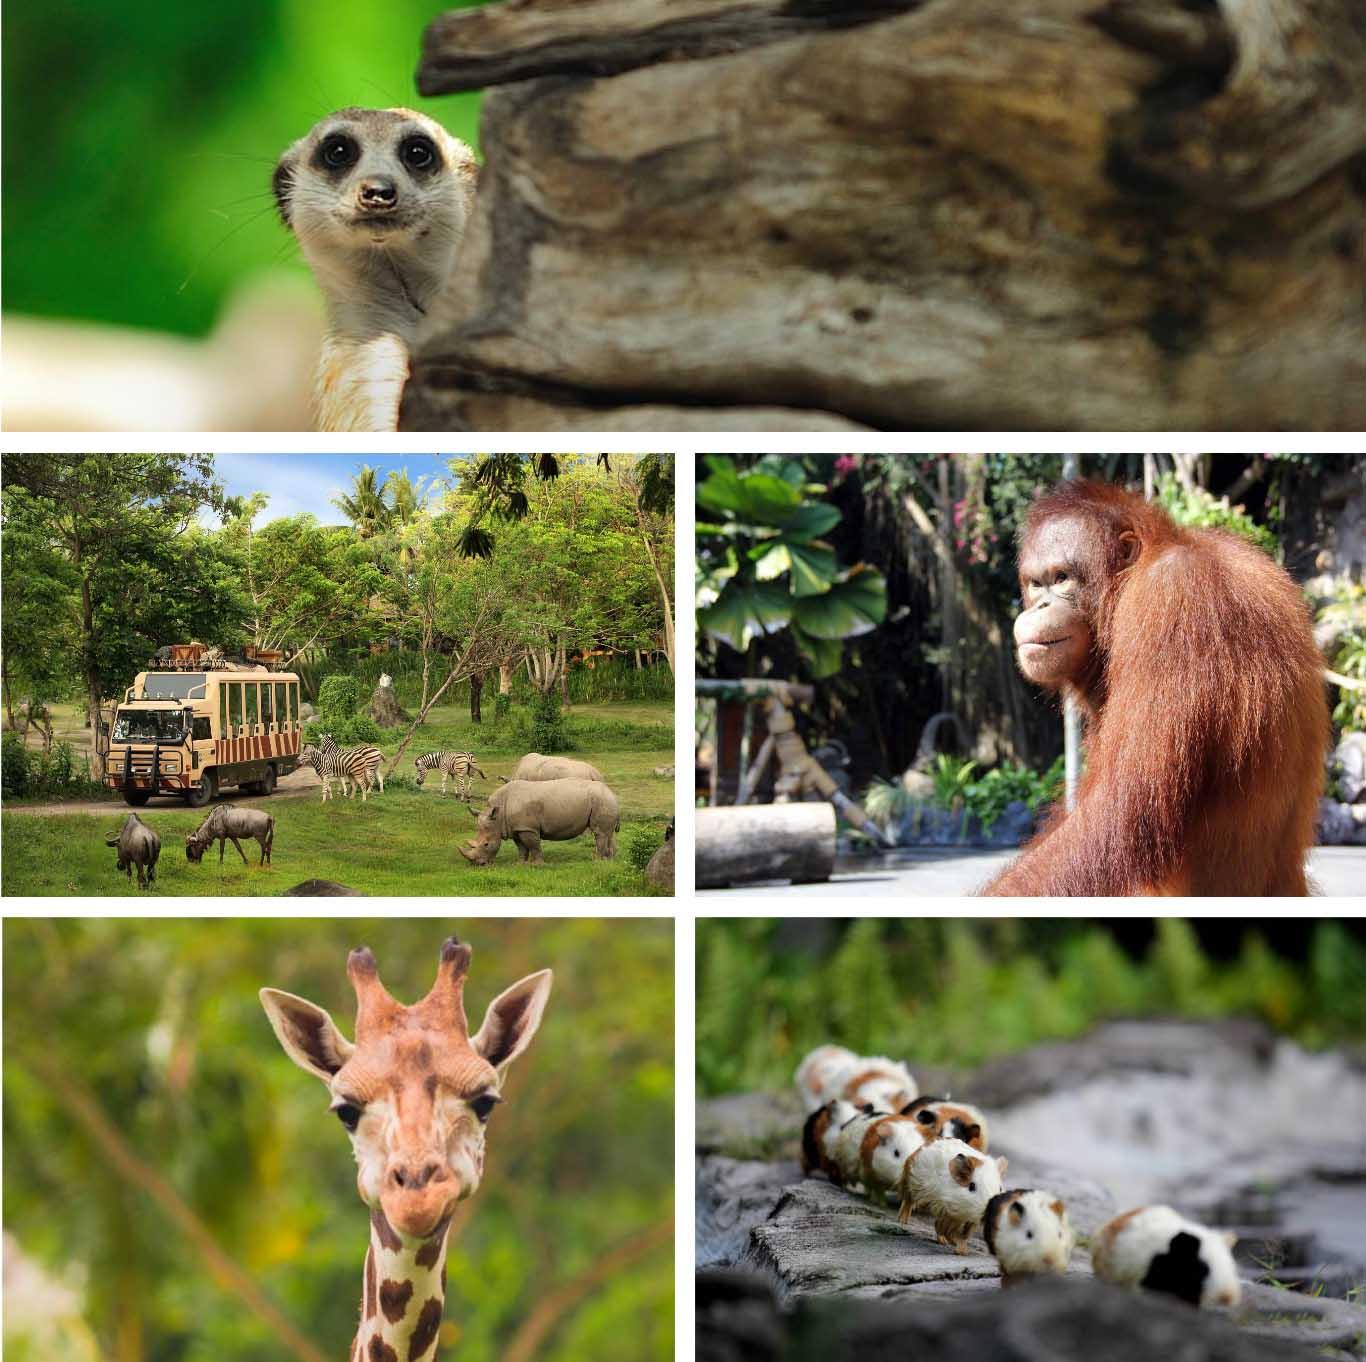 Bali Safari & Marine Park - Bali's Wild Side - Animal Attractions